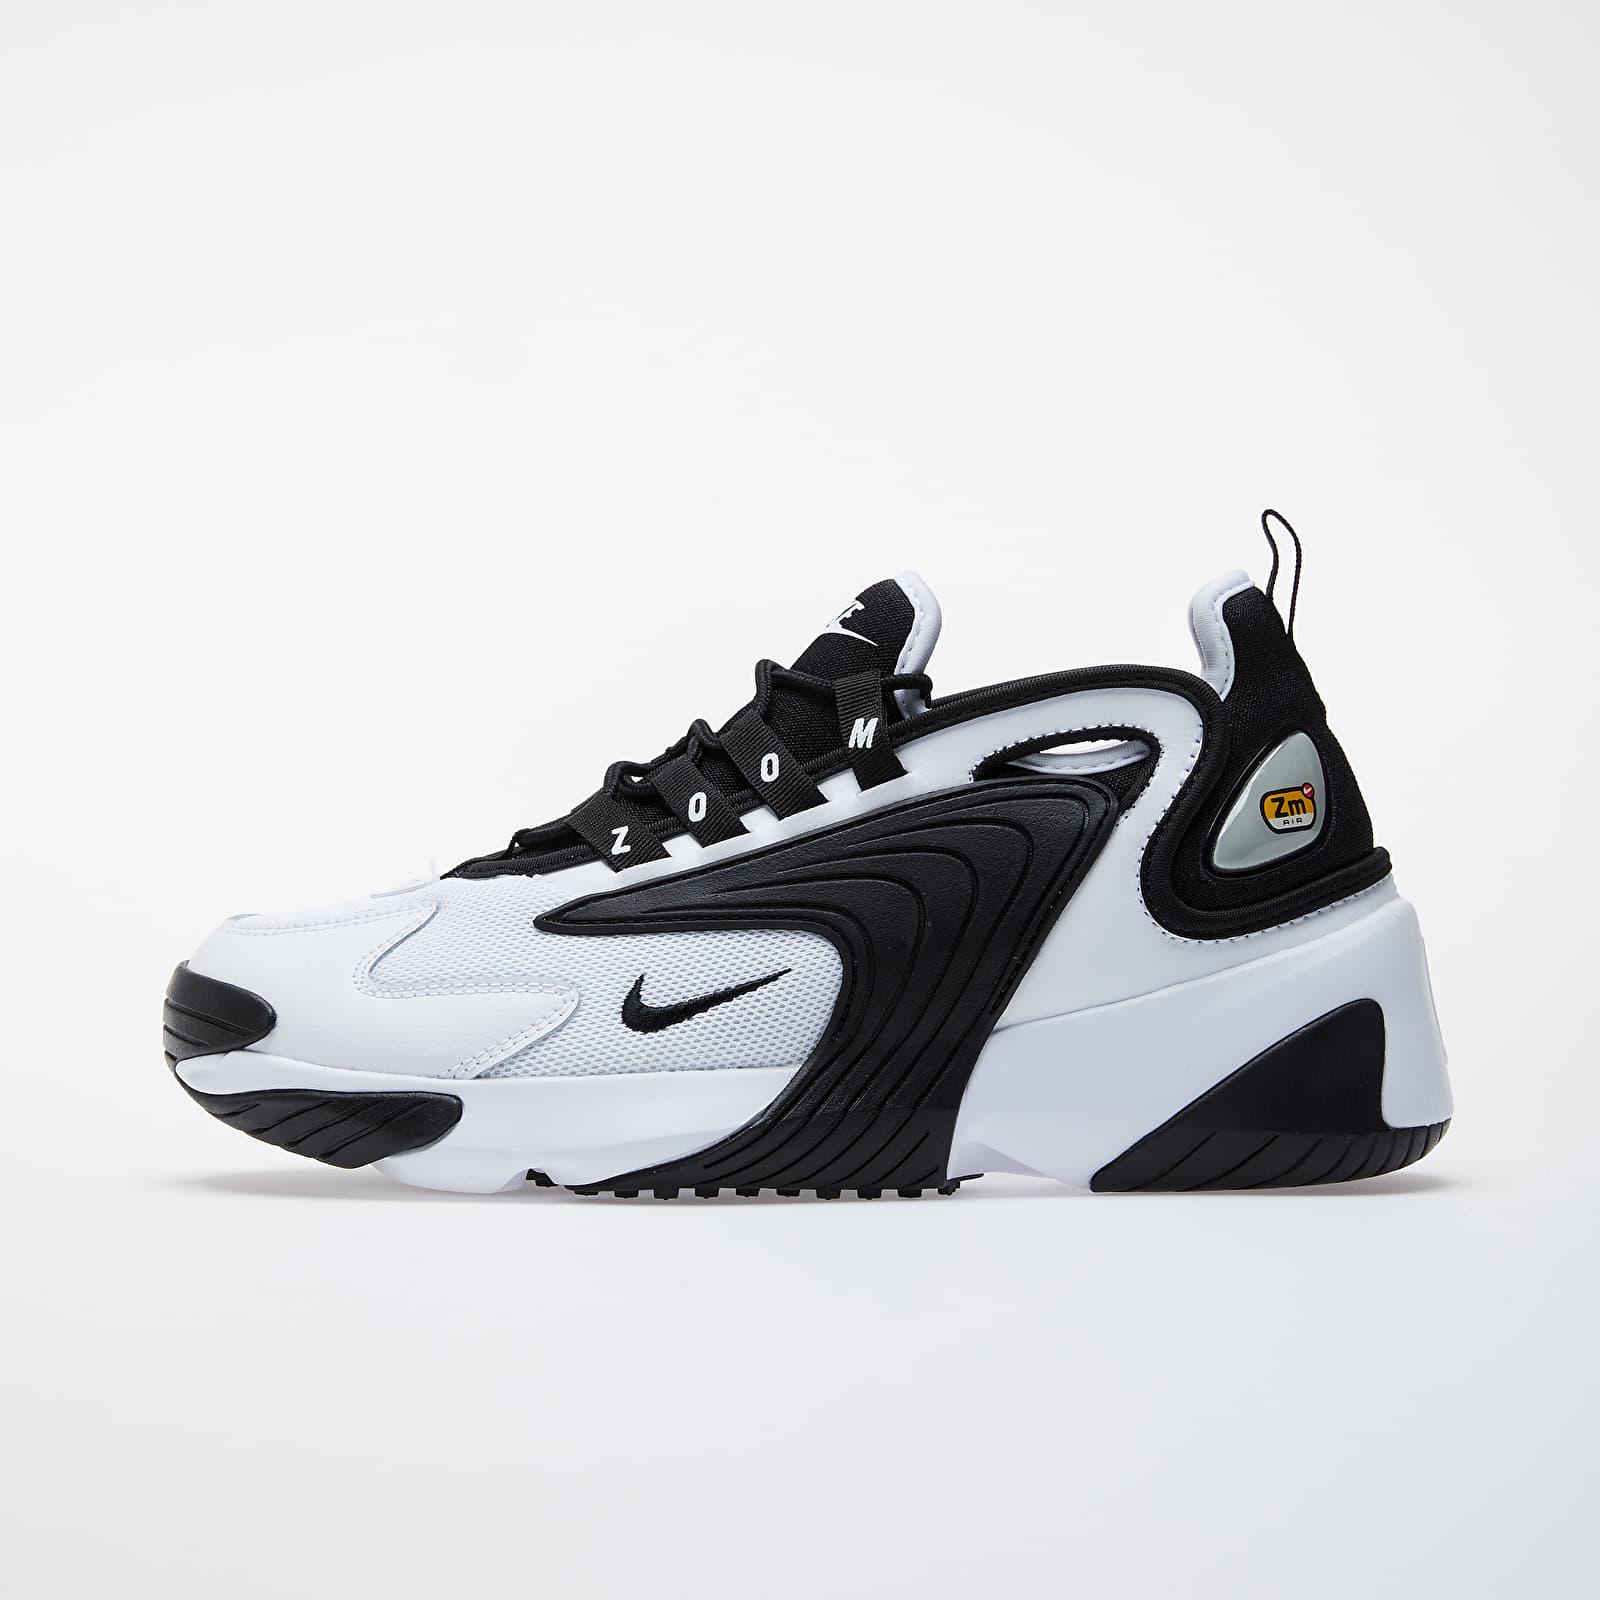 Buty damskie Nike Wmns Zoom 2K White/ Black